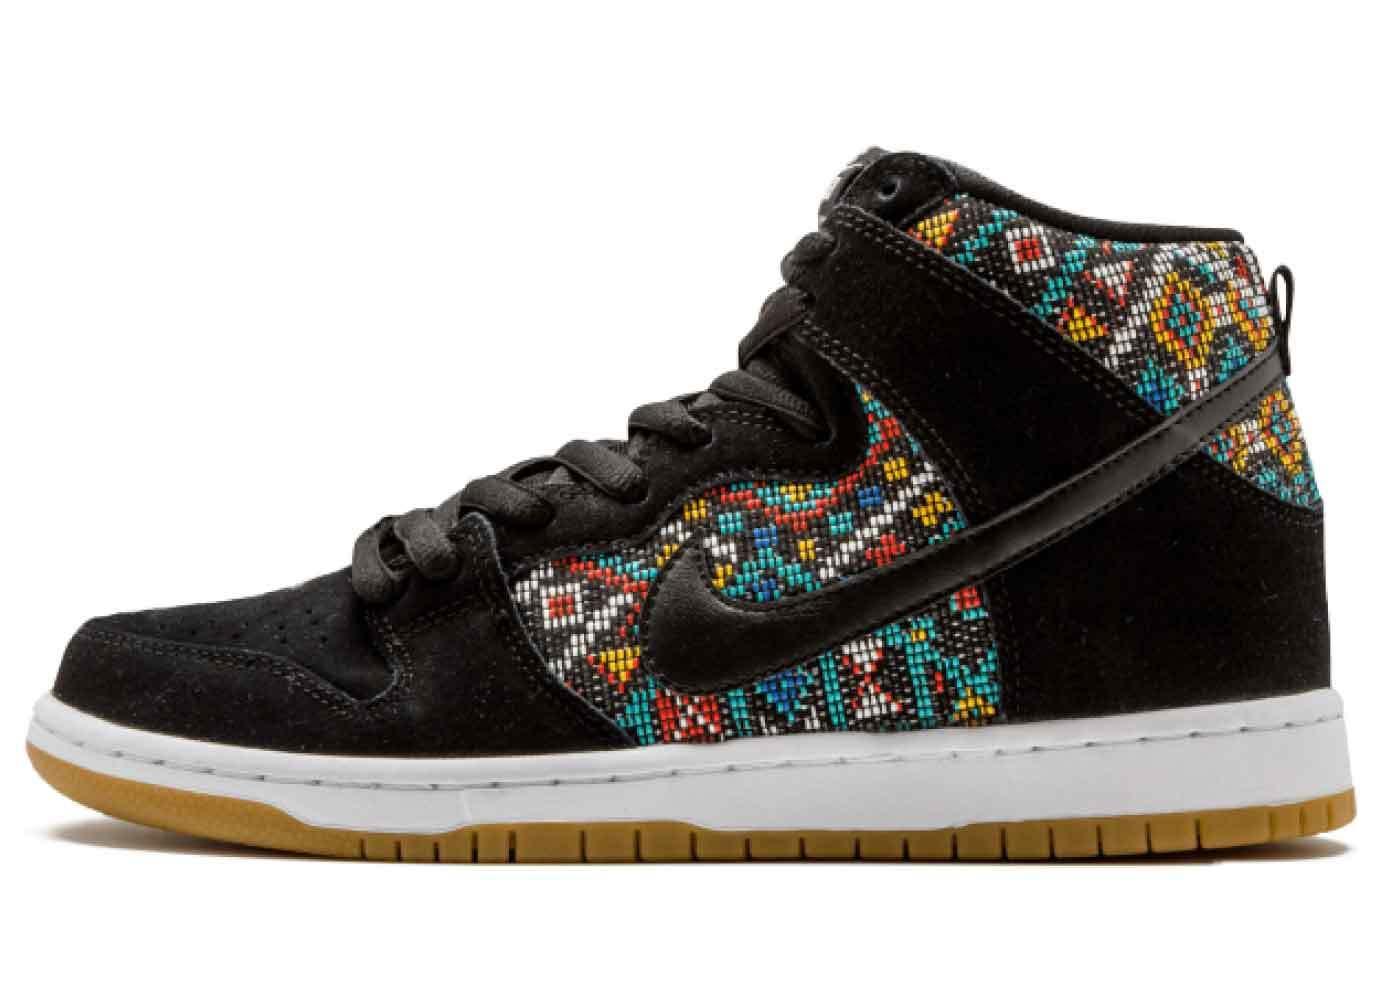 Nike SB Dunk High Aztec Geometryの写真